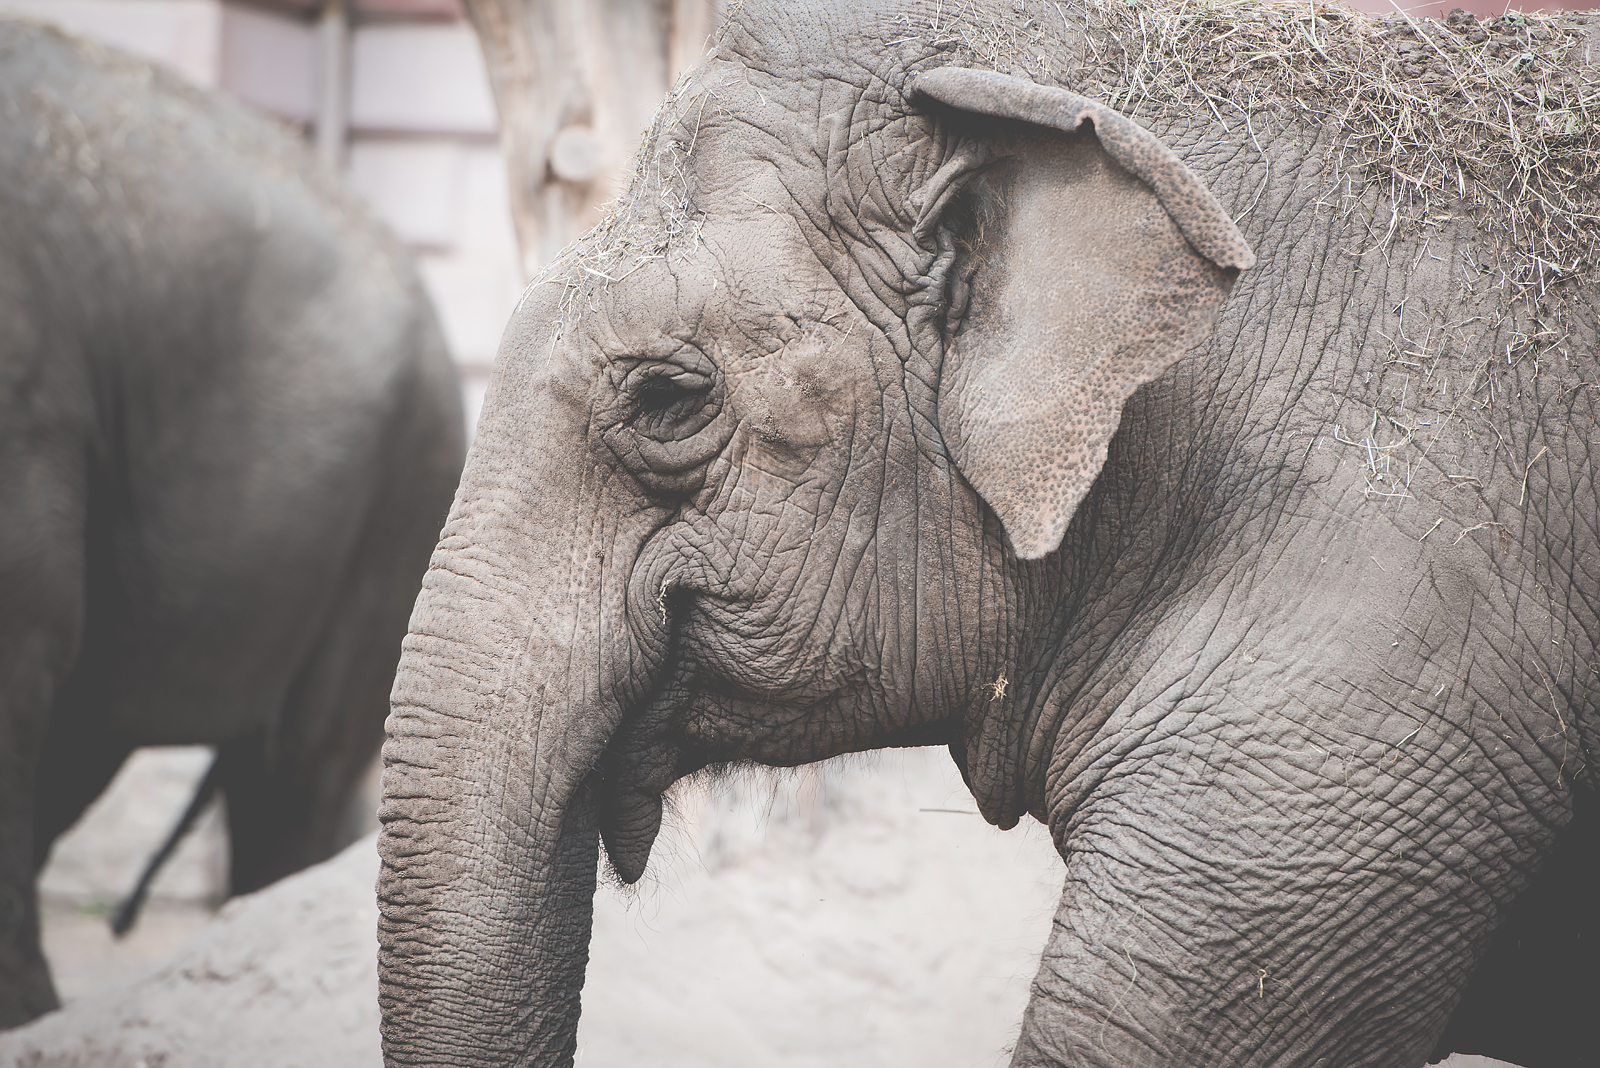 slon wroclaw zoo